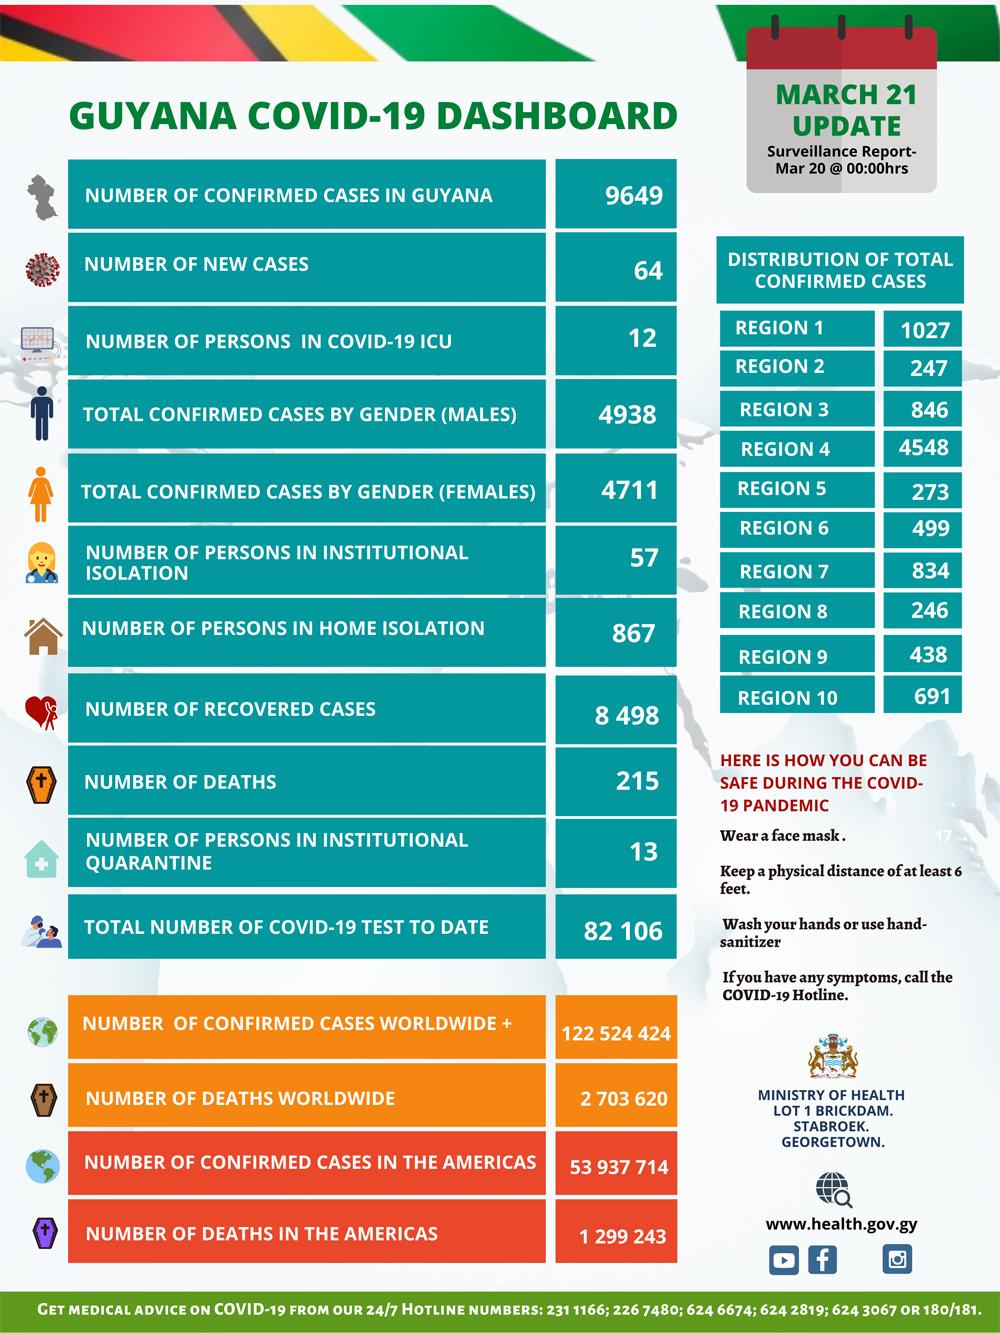 Guyana speeding to 10,000 COVID-19 cases